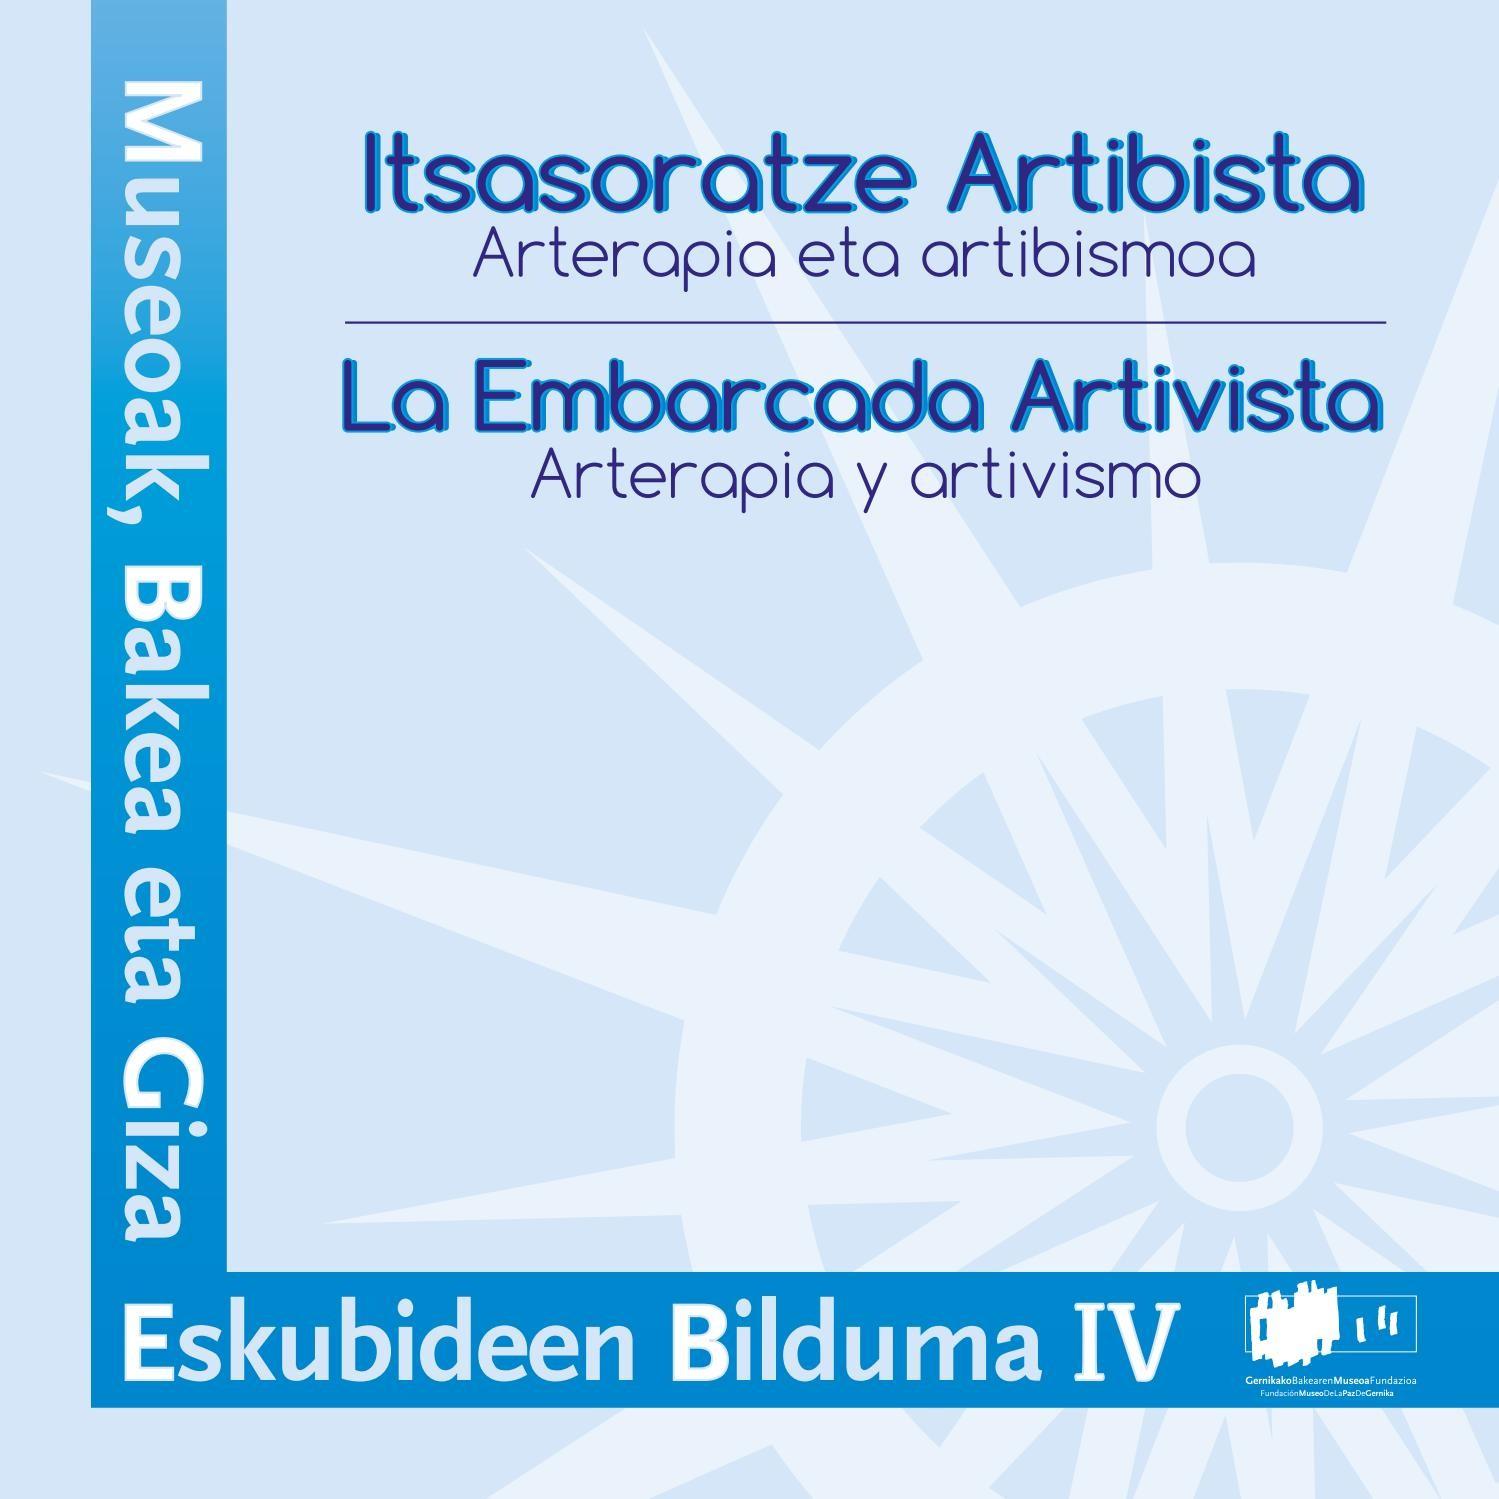 Embarcada artivista Itsasoratze artibista by Museo de la Paz de Gernika issuu